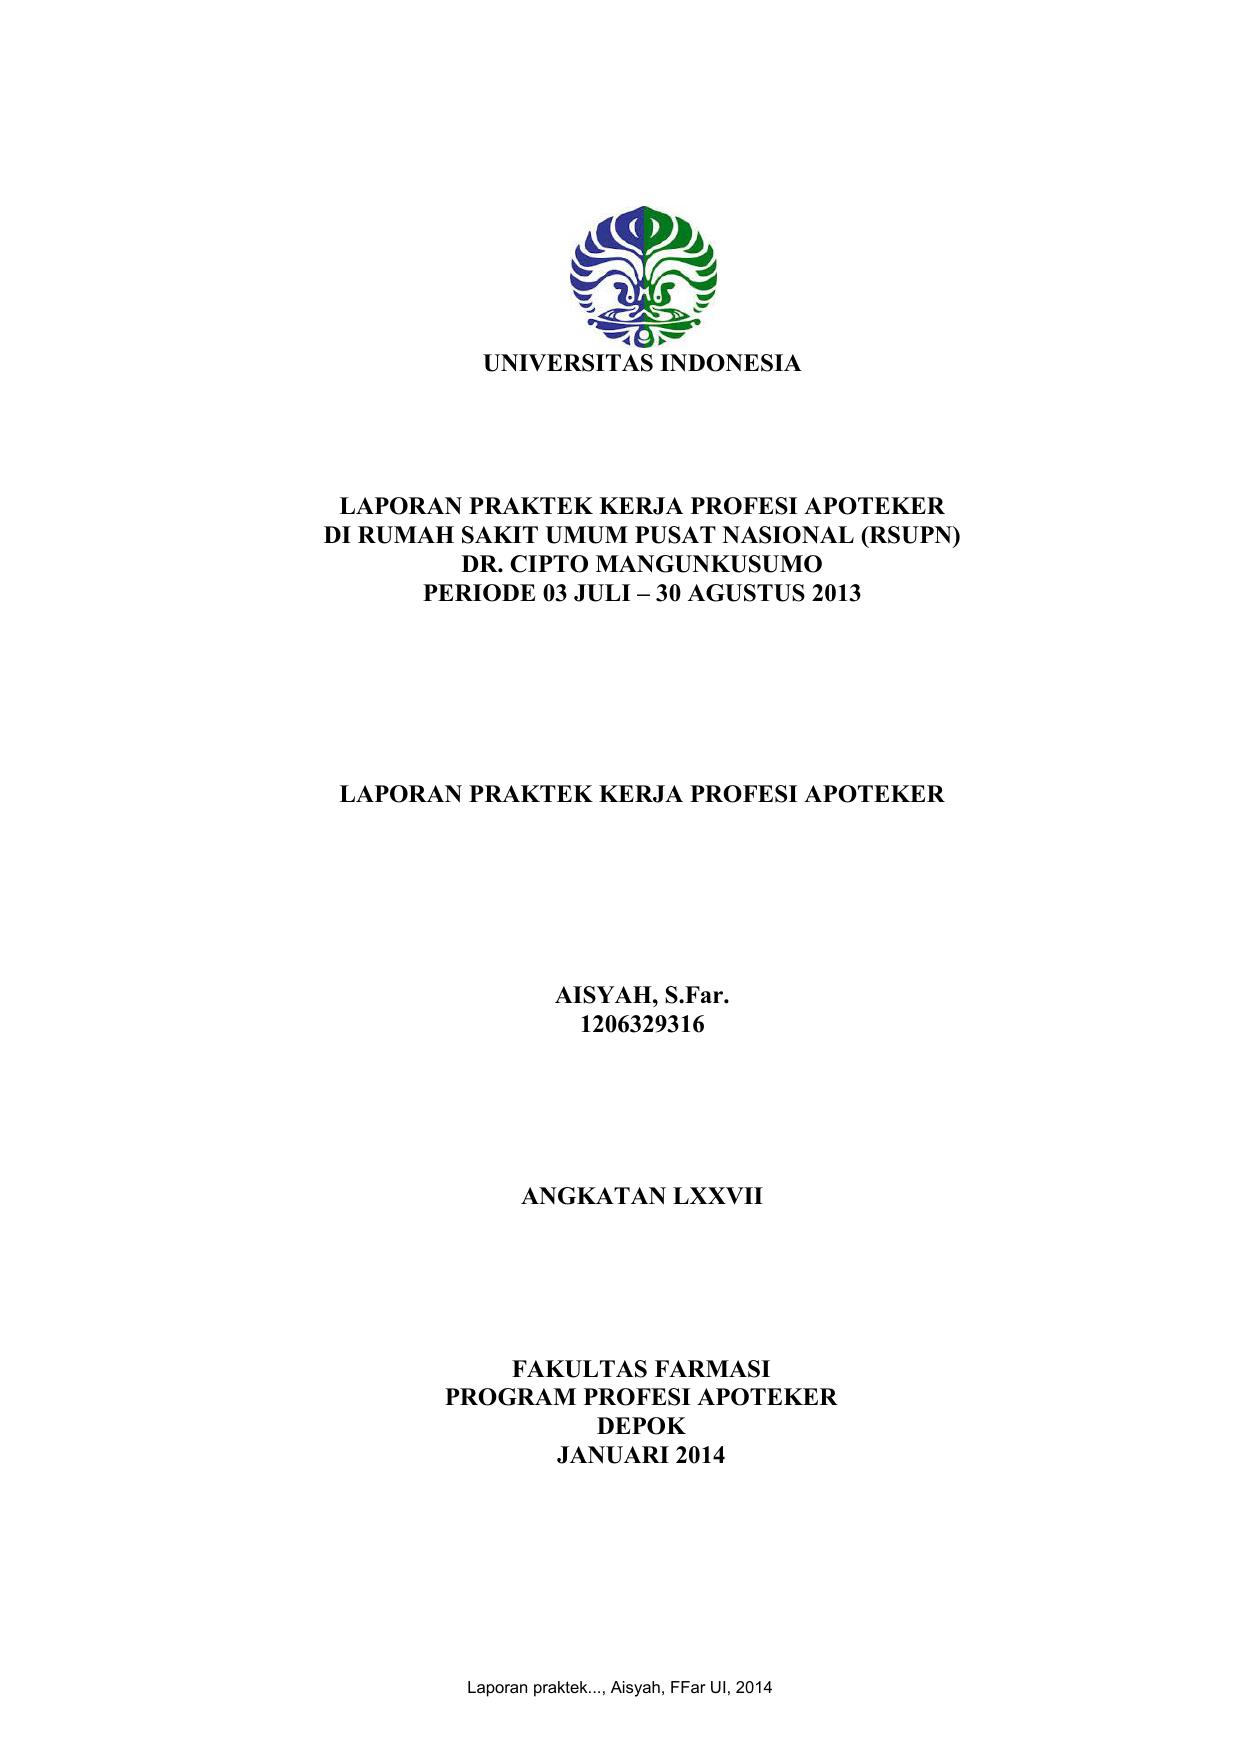 Universitas Indonesia Laporan Praktek Kerja Profesi Apoteker Di